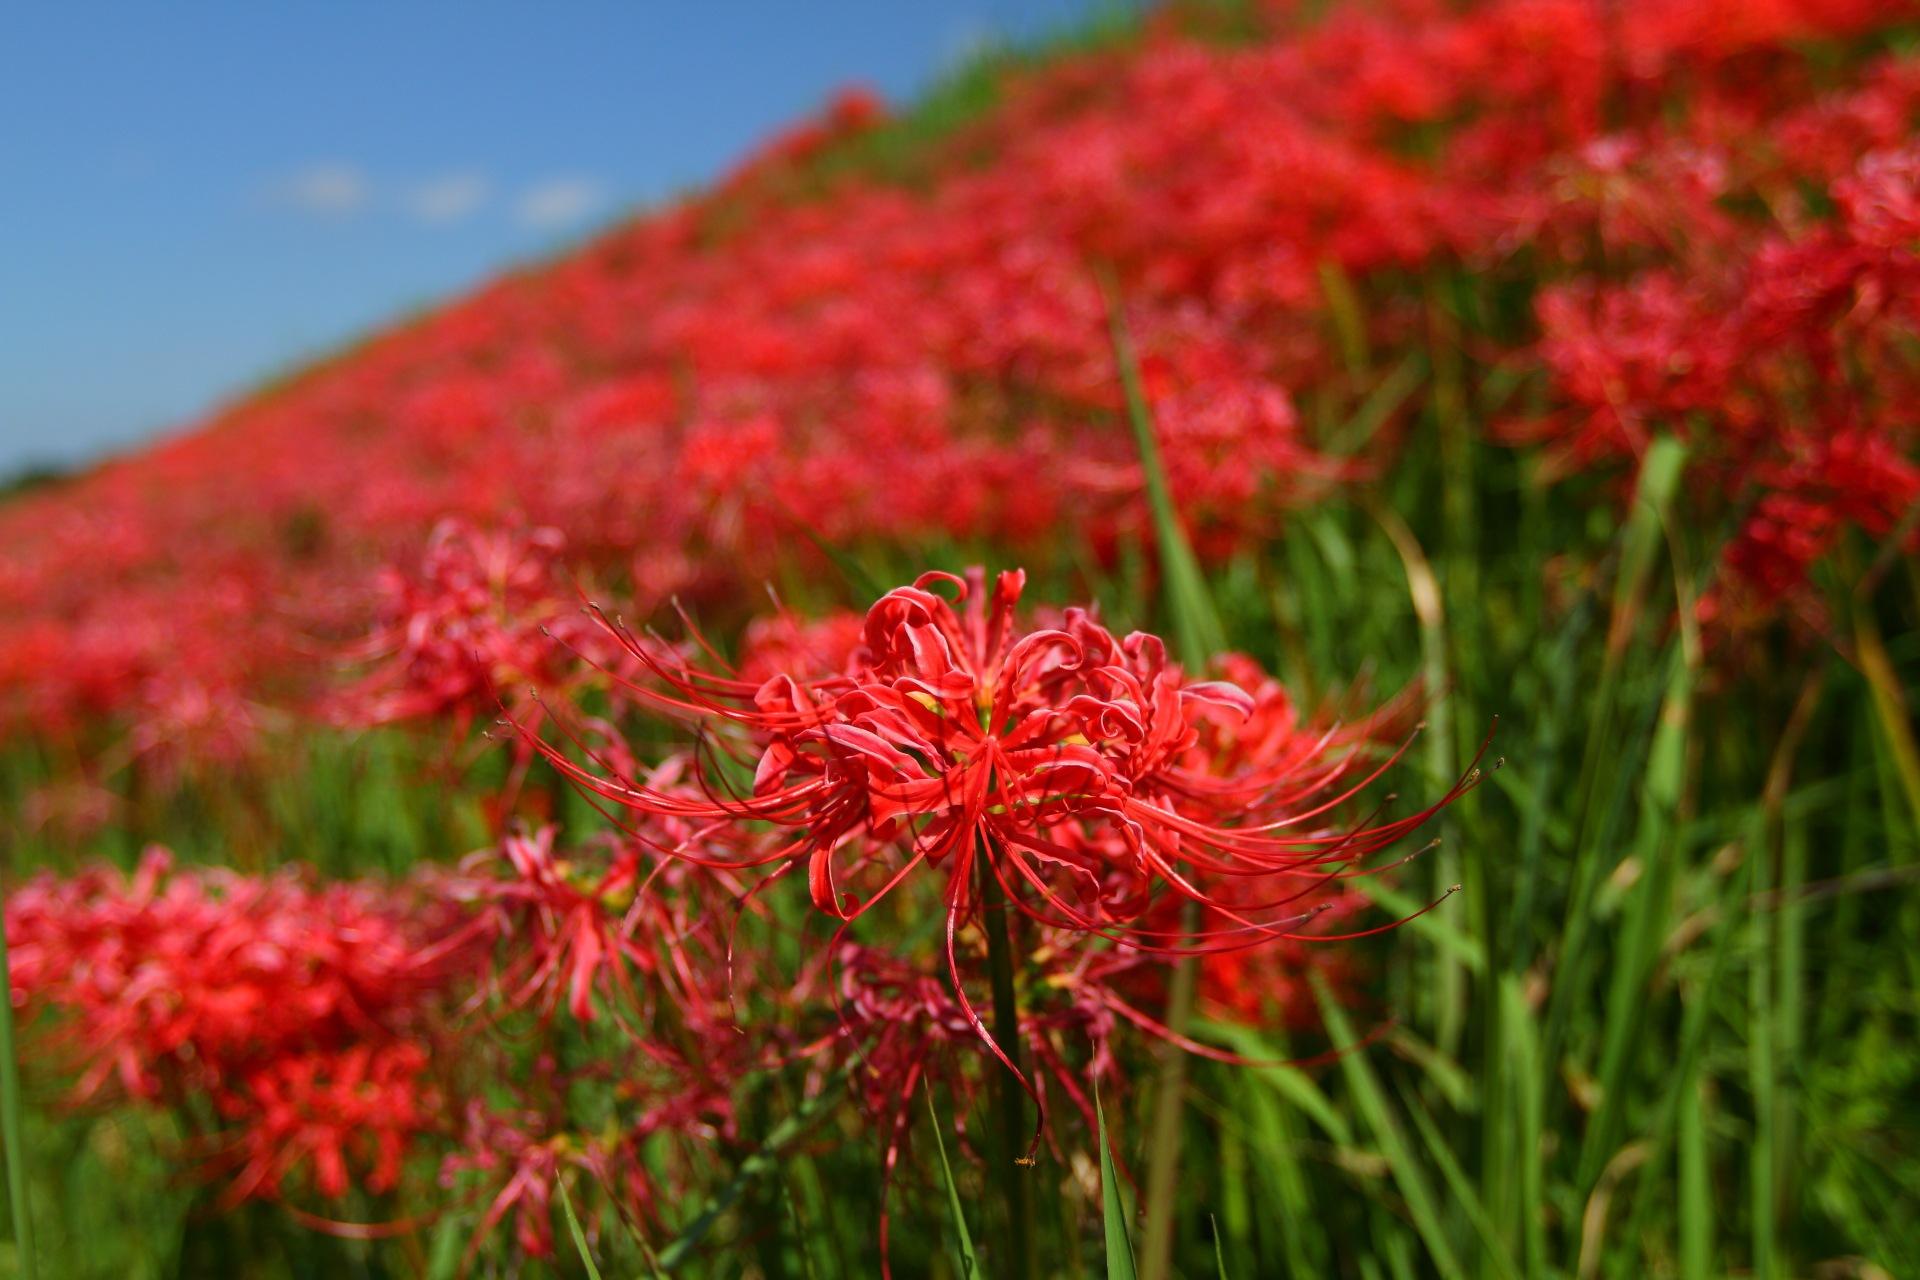 Red Spider Lily by takashi.mizoguchi